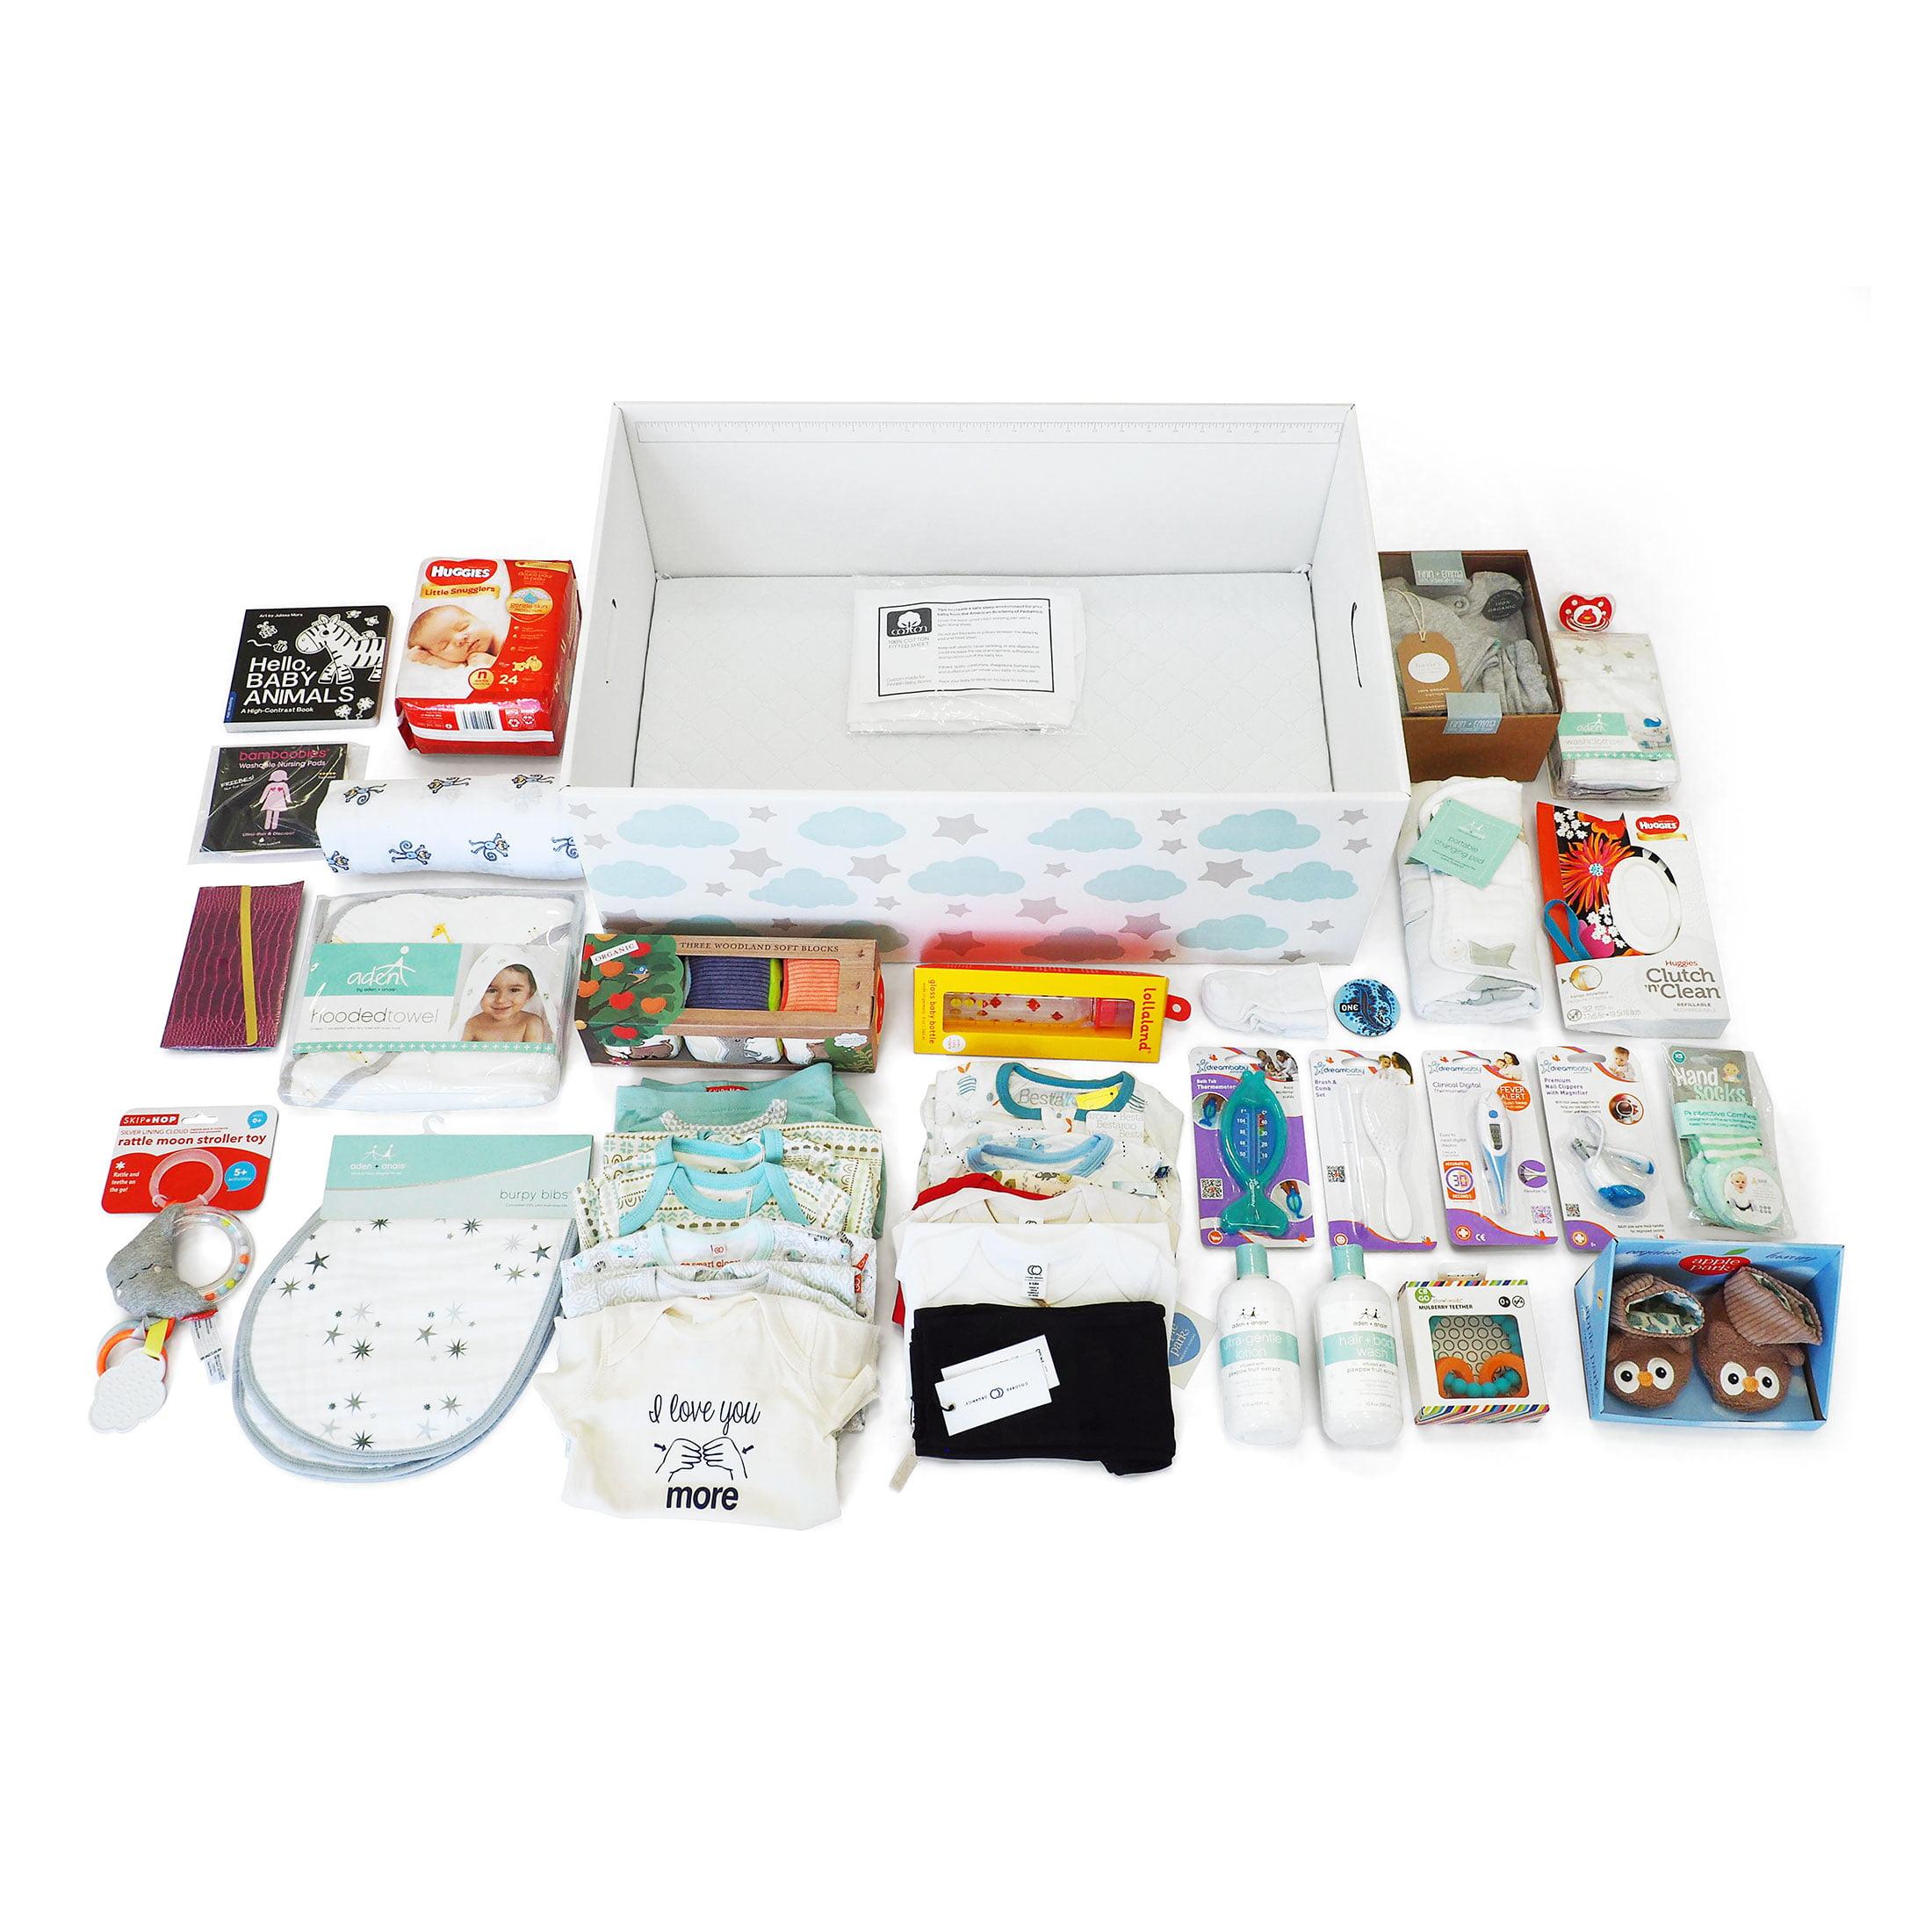 Finnbin | Baby Box Bundle: Second Child Special